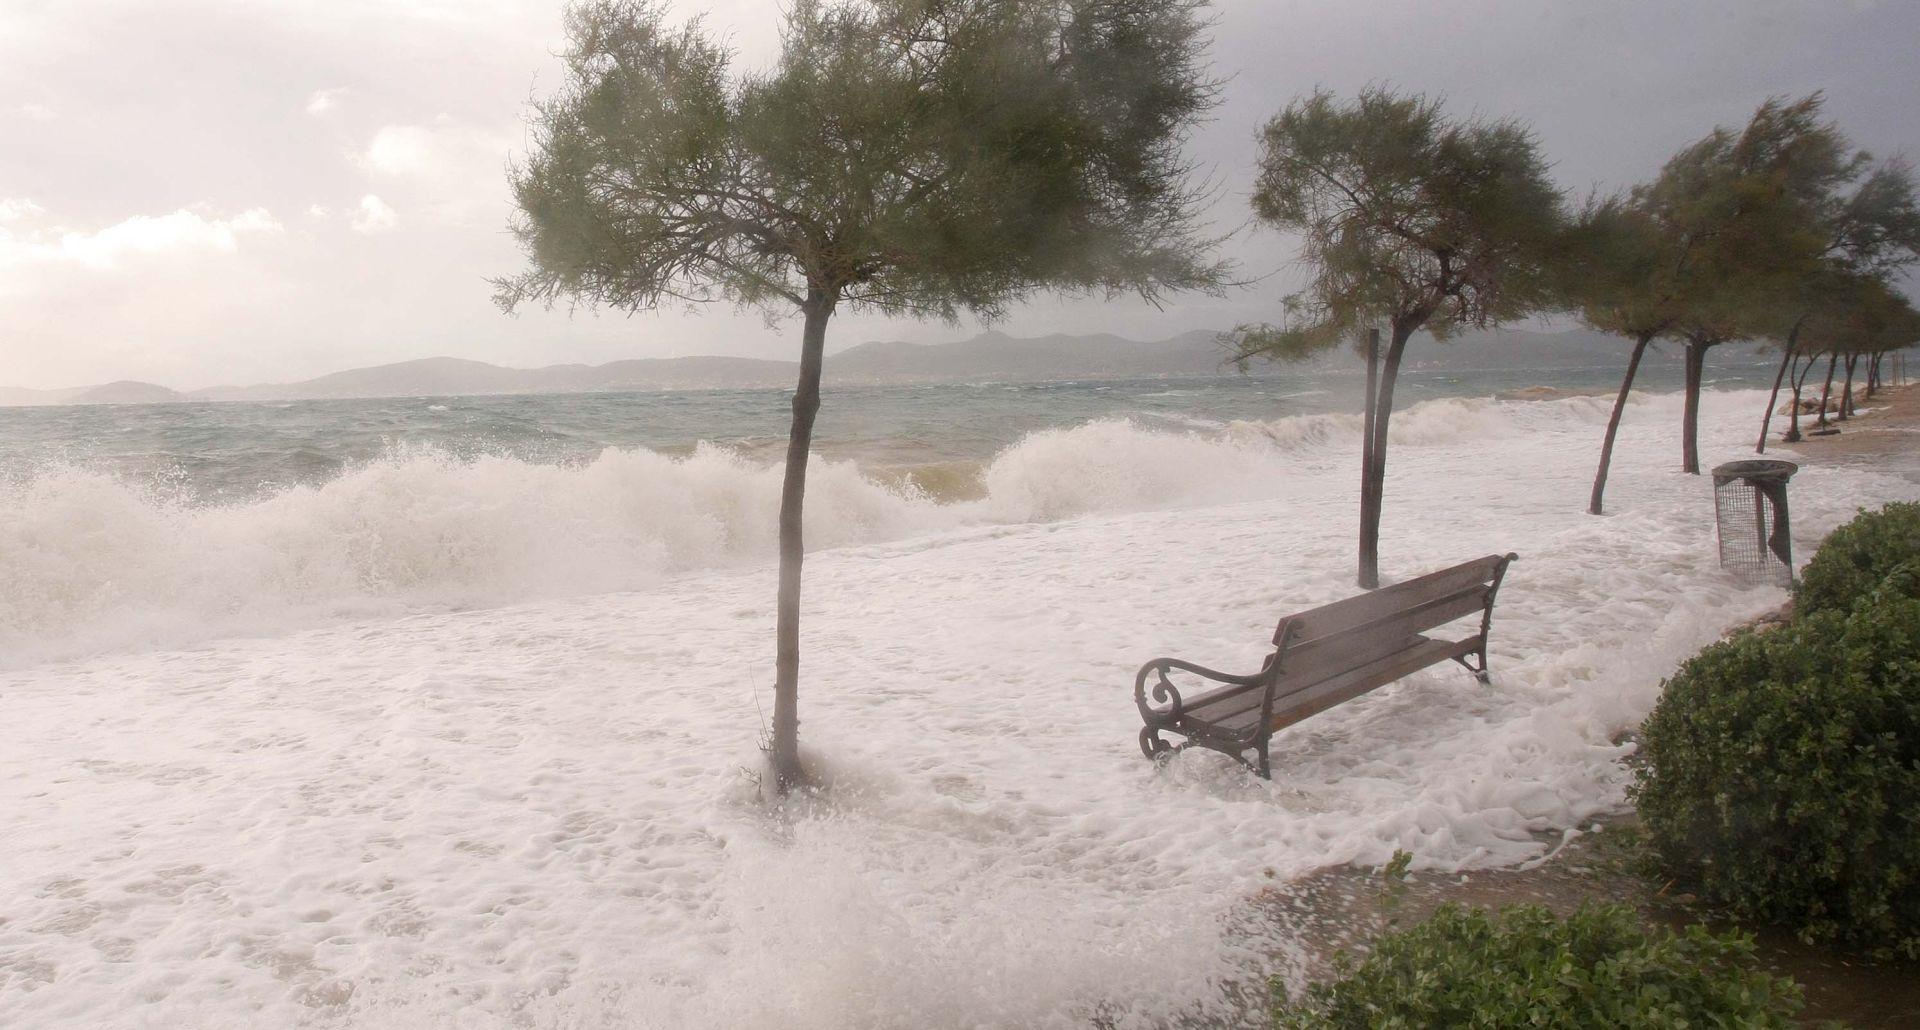 OTKAZANI LETOVI: Oluja Katie pogodila jug Engleske